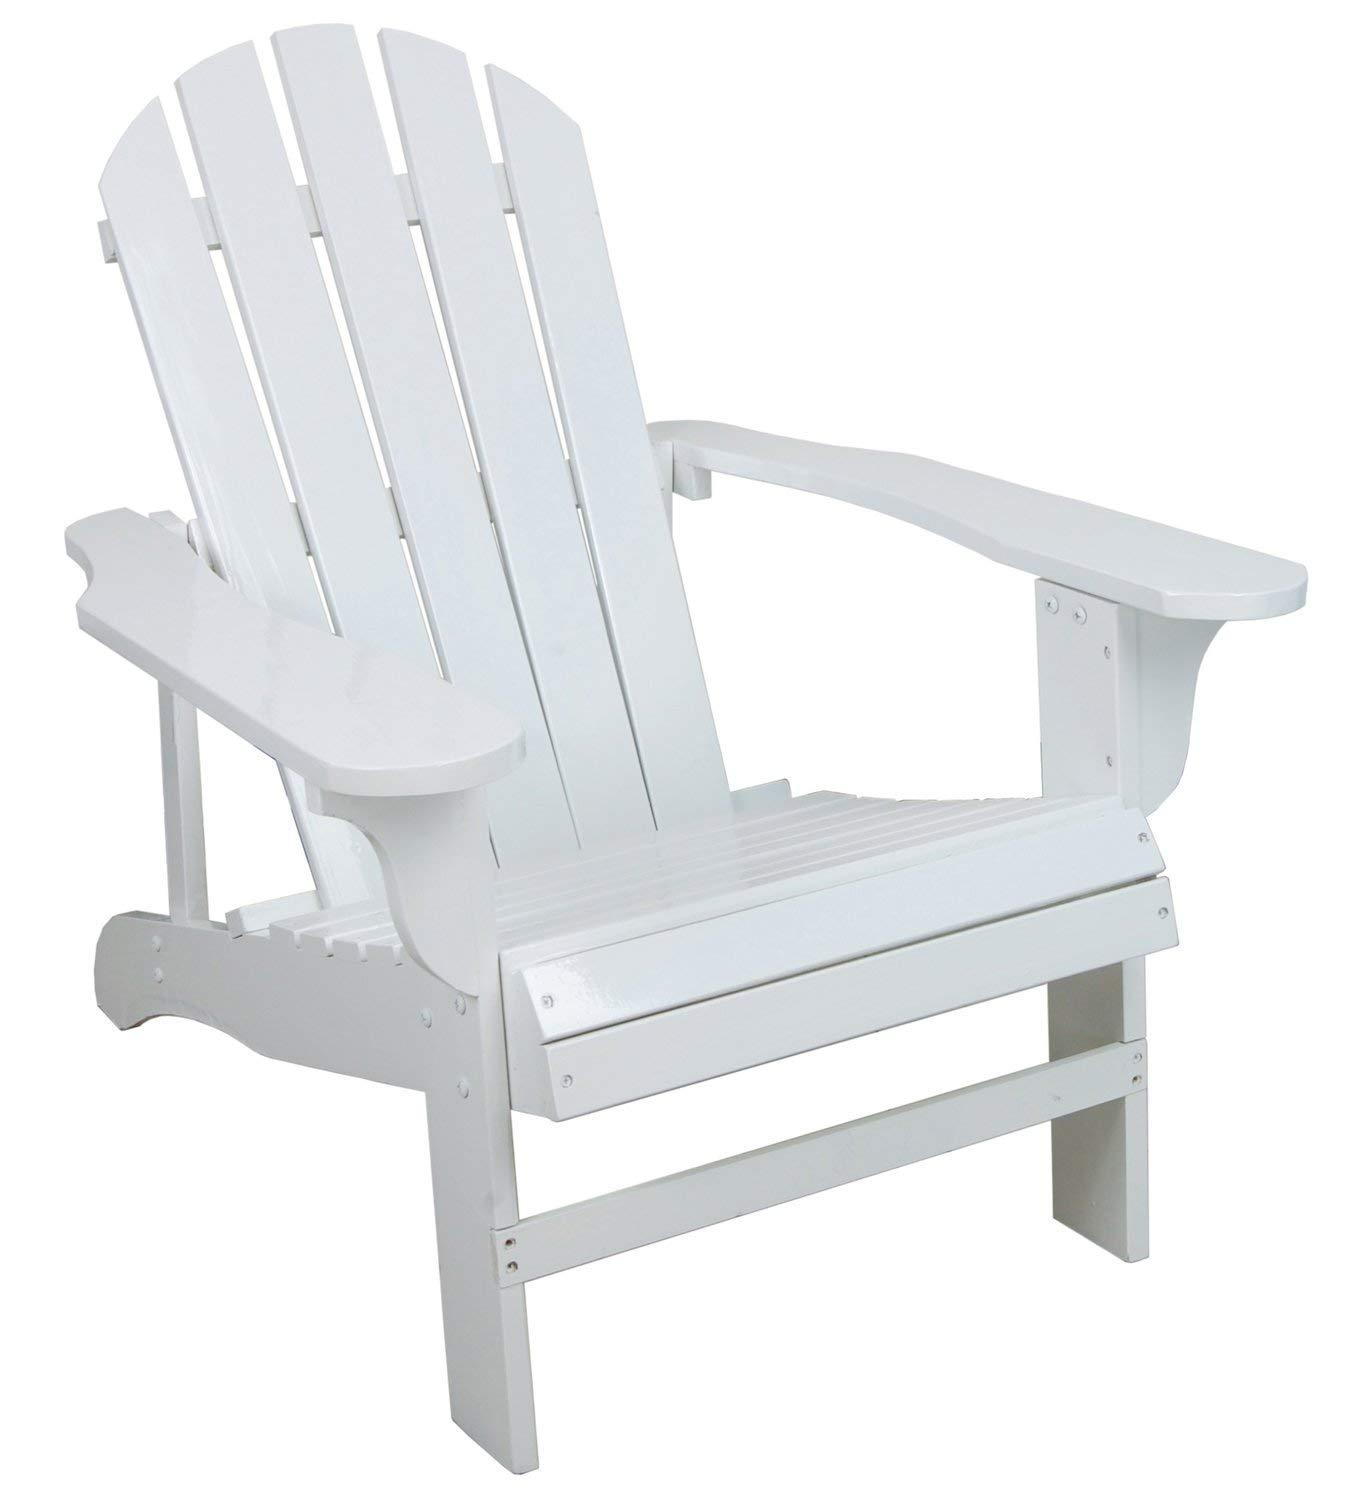 adirondack chairs amazon.com : classic white painted wood adirondack chair : chaise lounges XFCZQSF